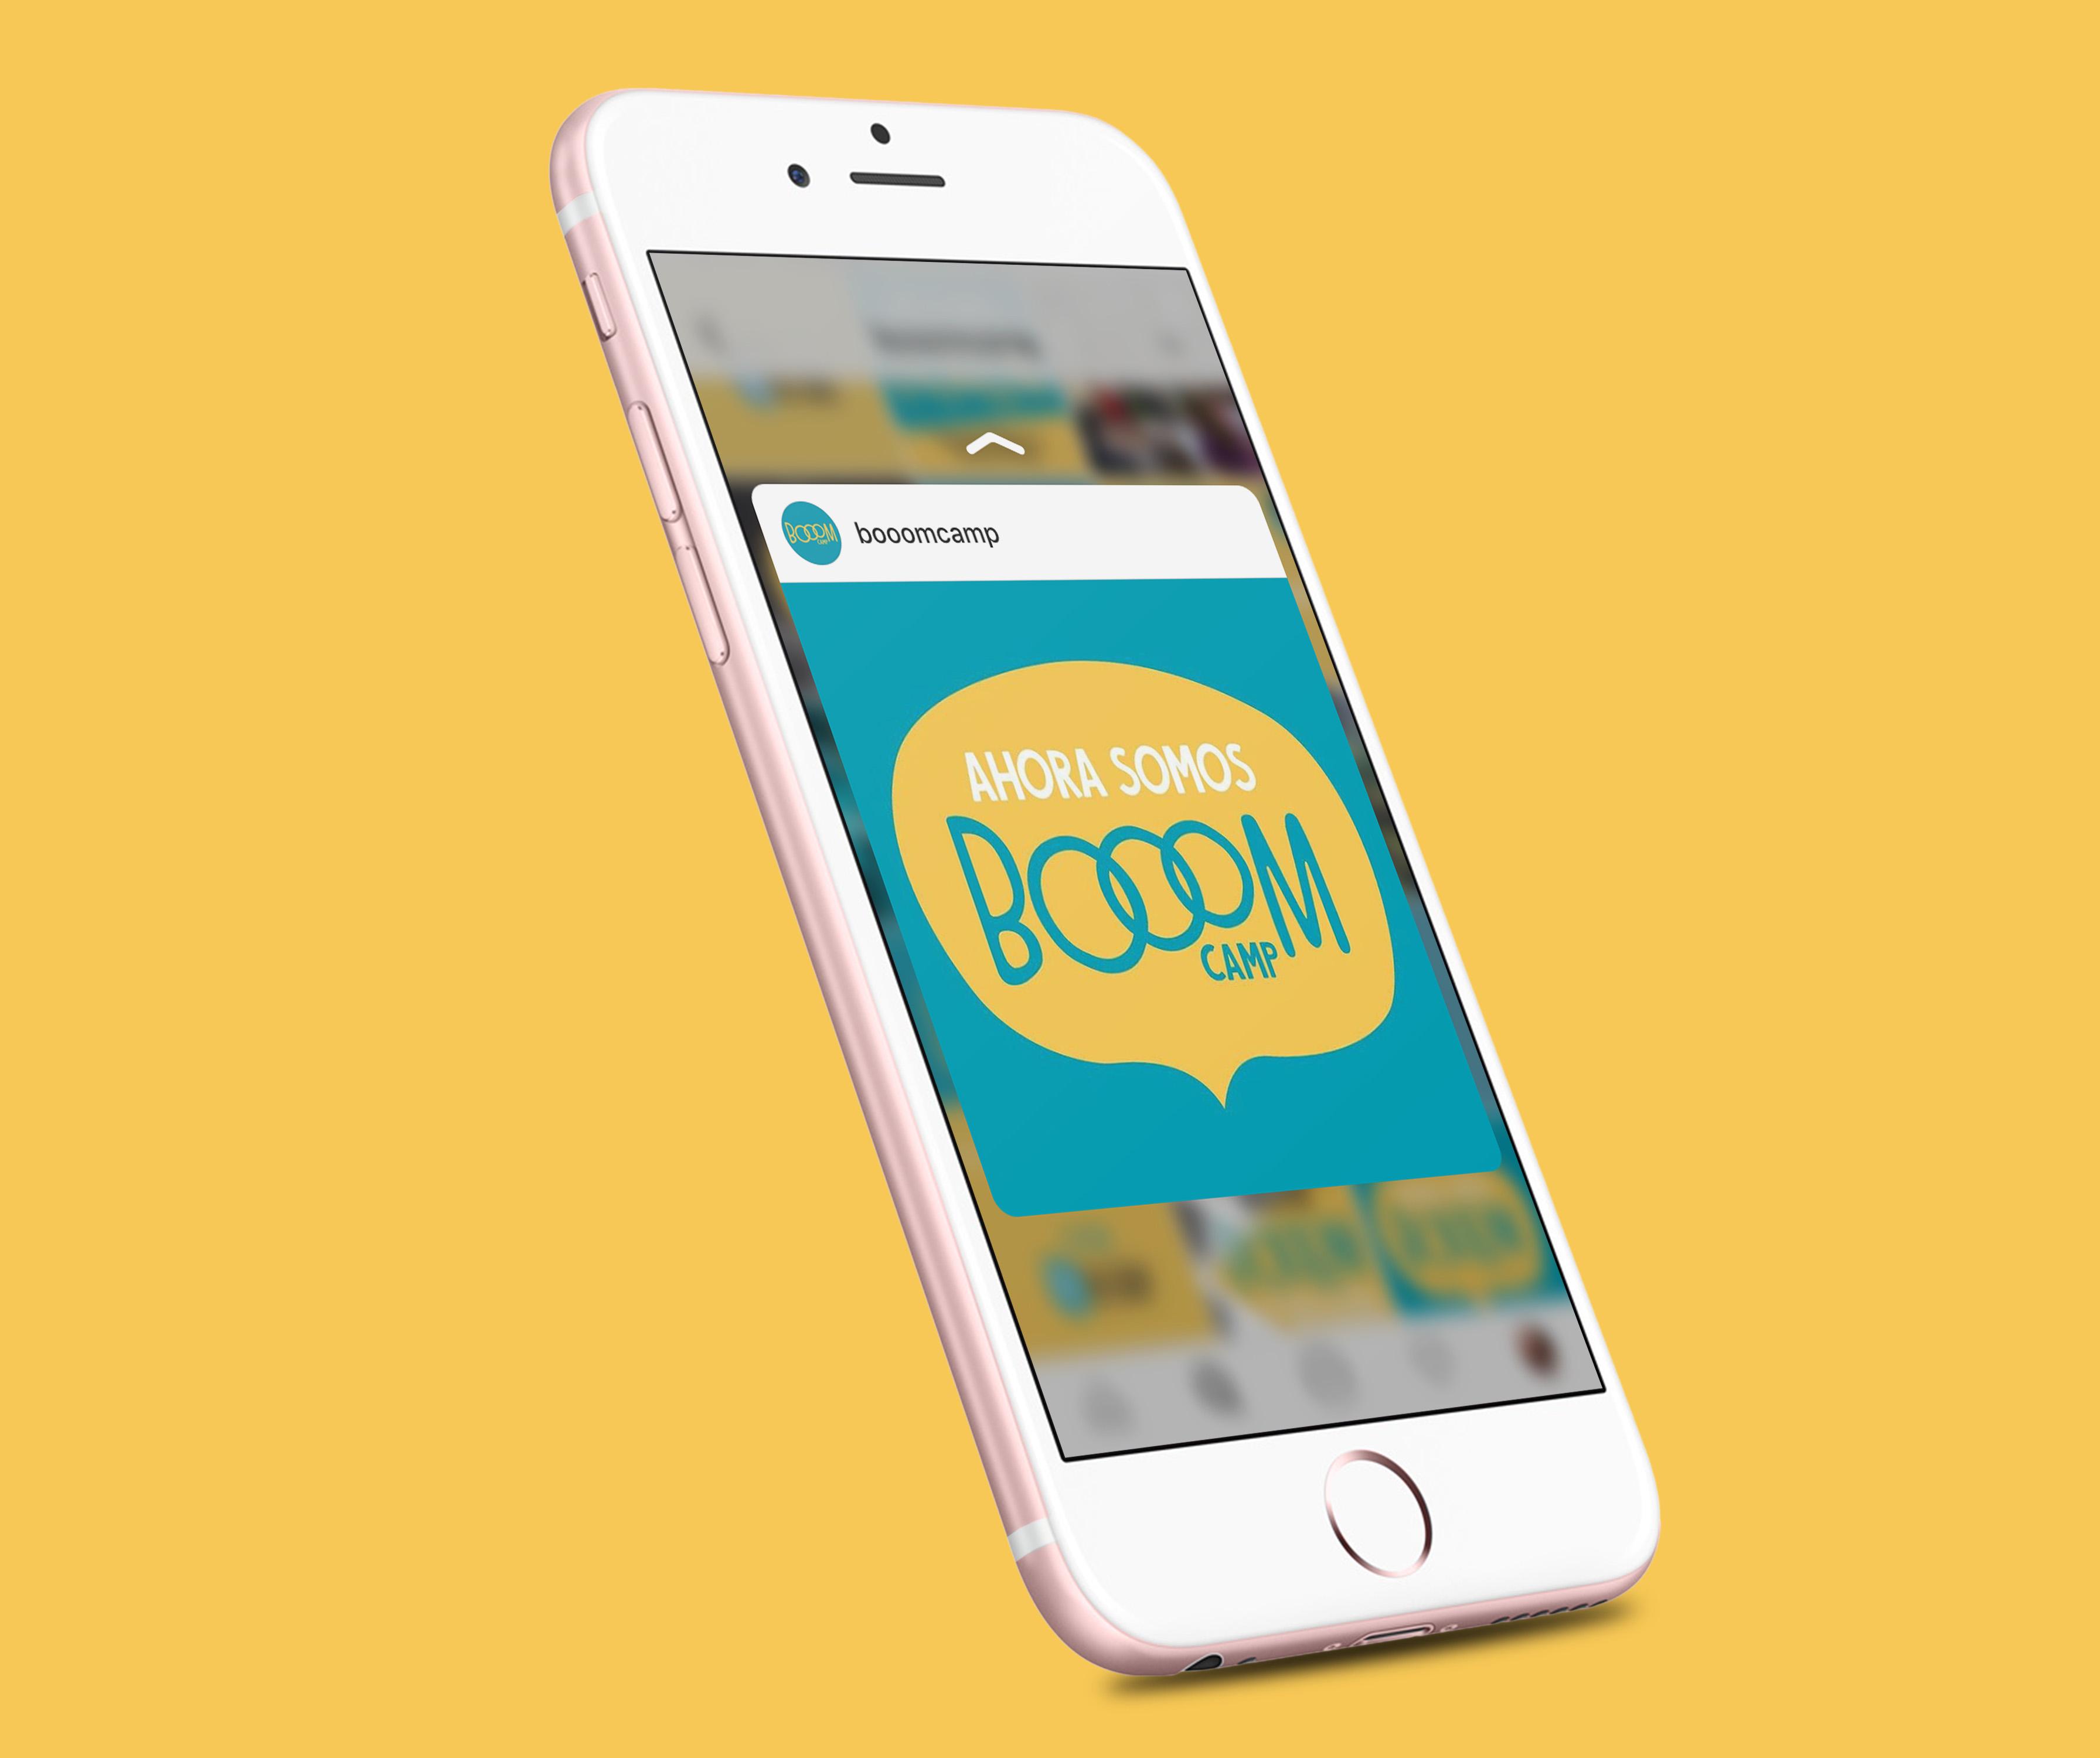 mockups-boomm-iphone1